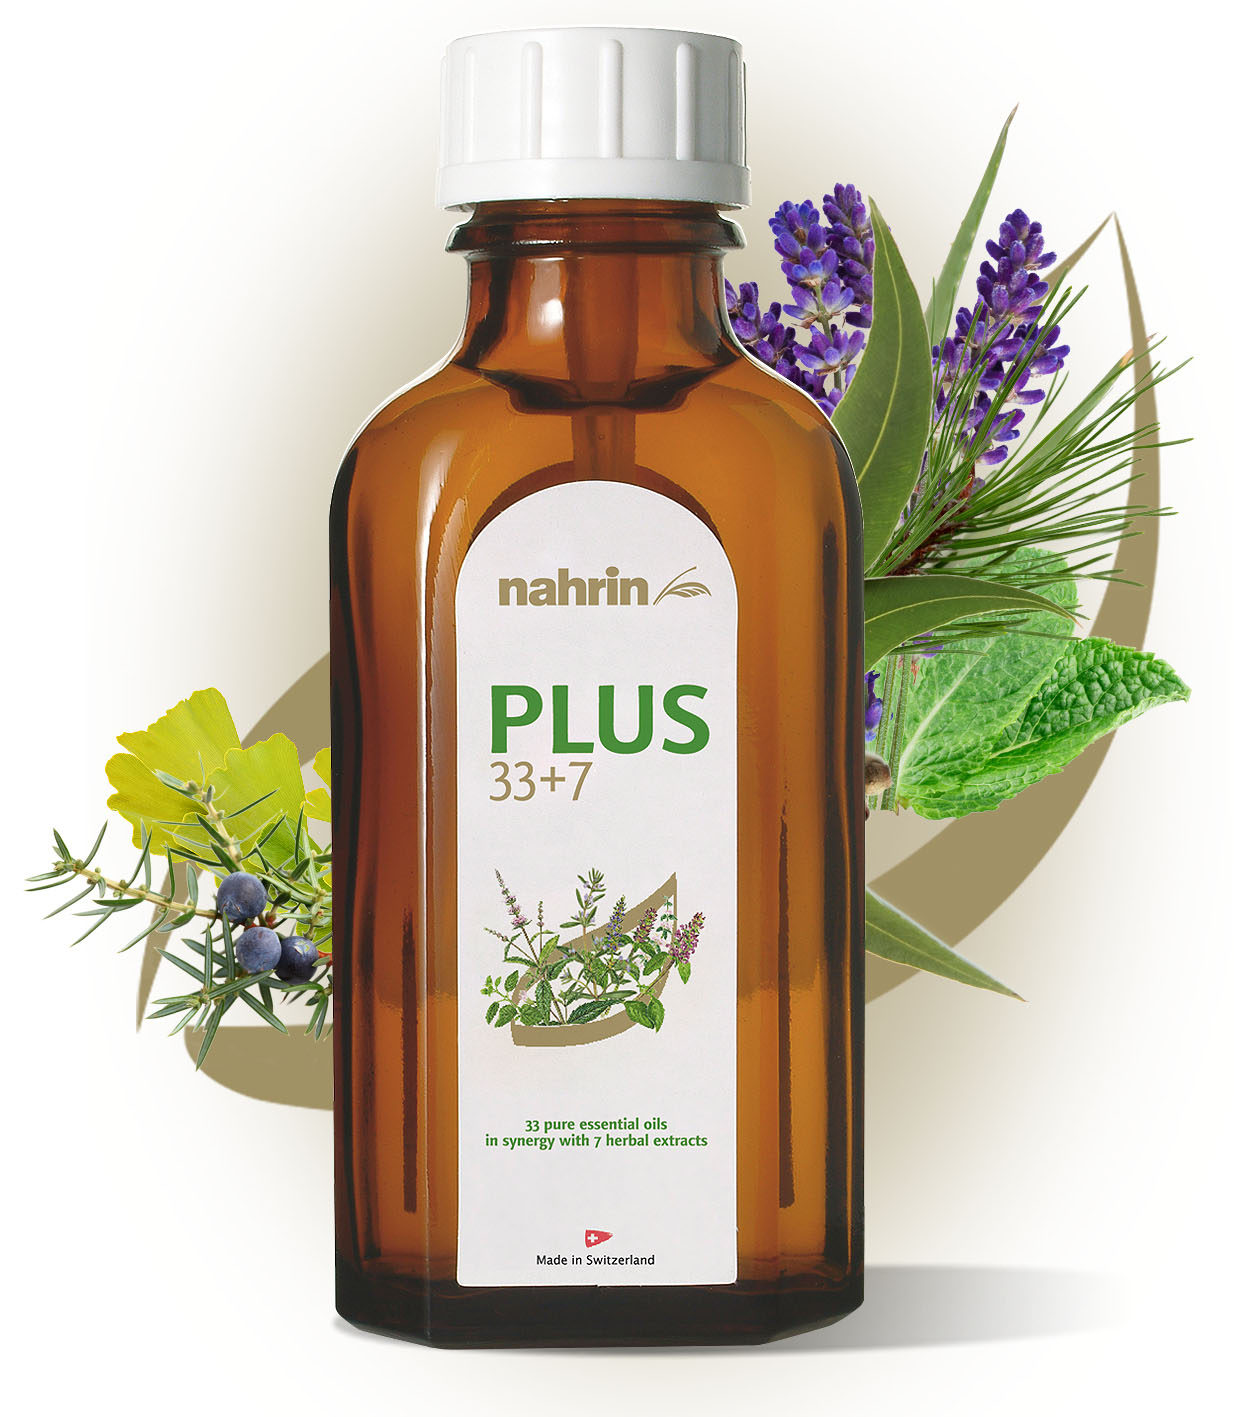 Nahrin Herbal Oil PLUS 33+7 - 50ml